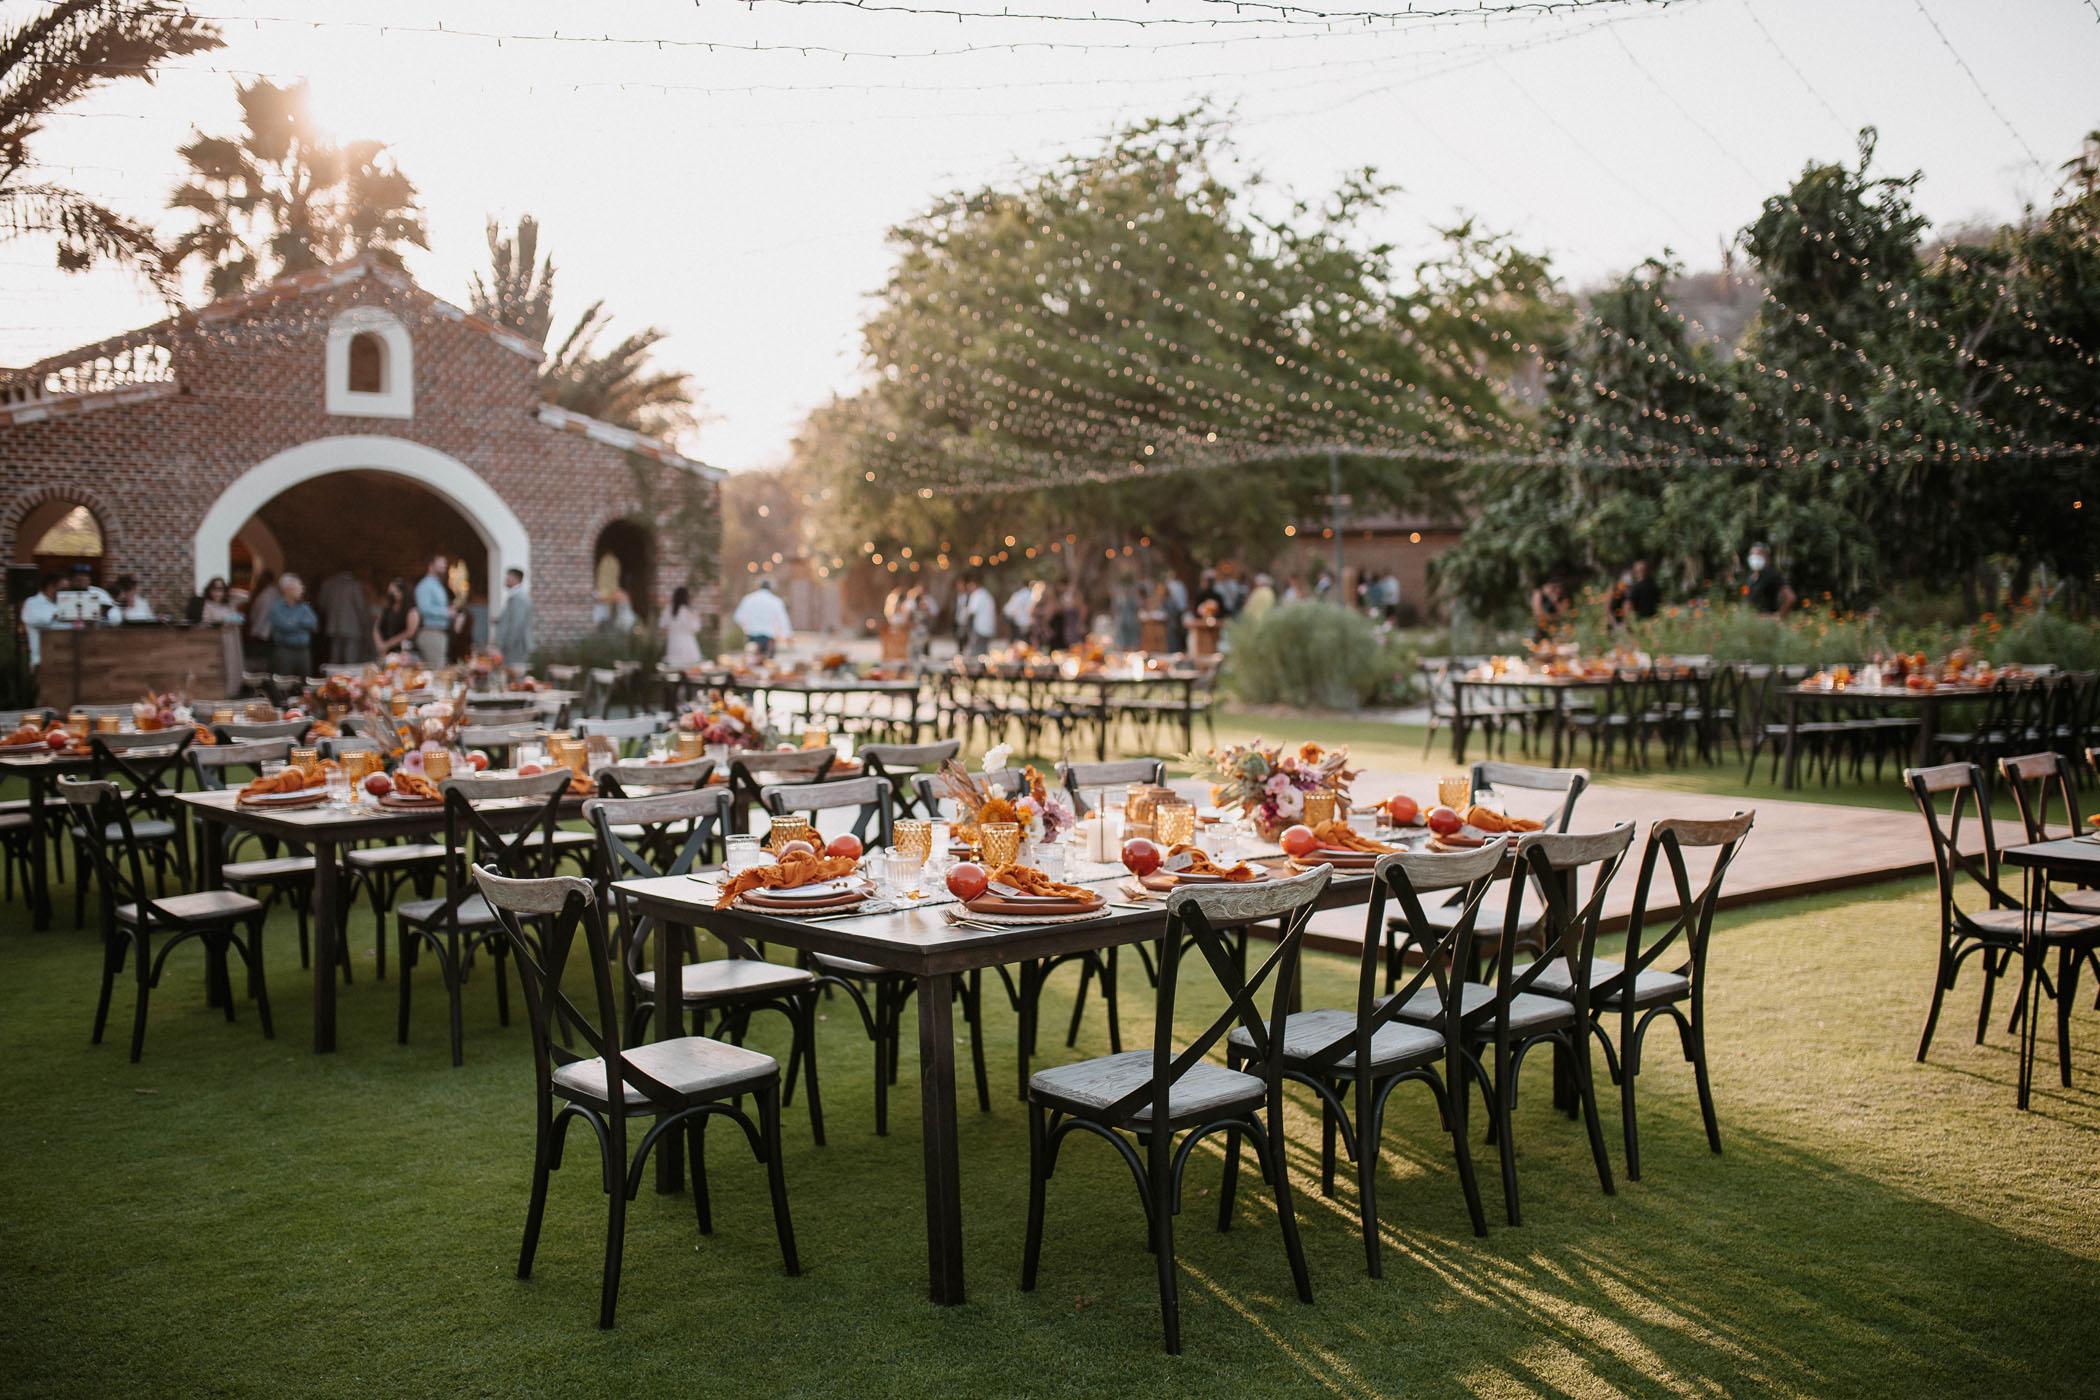 Terracotta and peach wedding reception